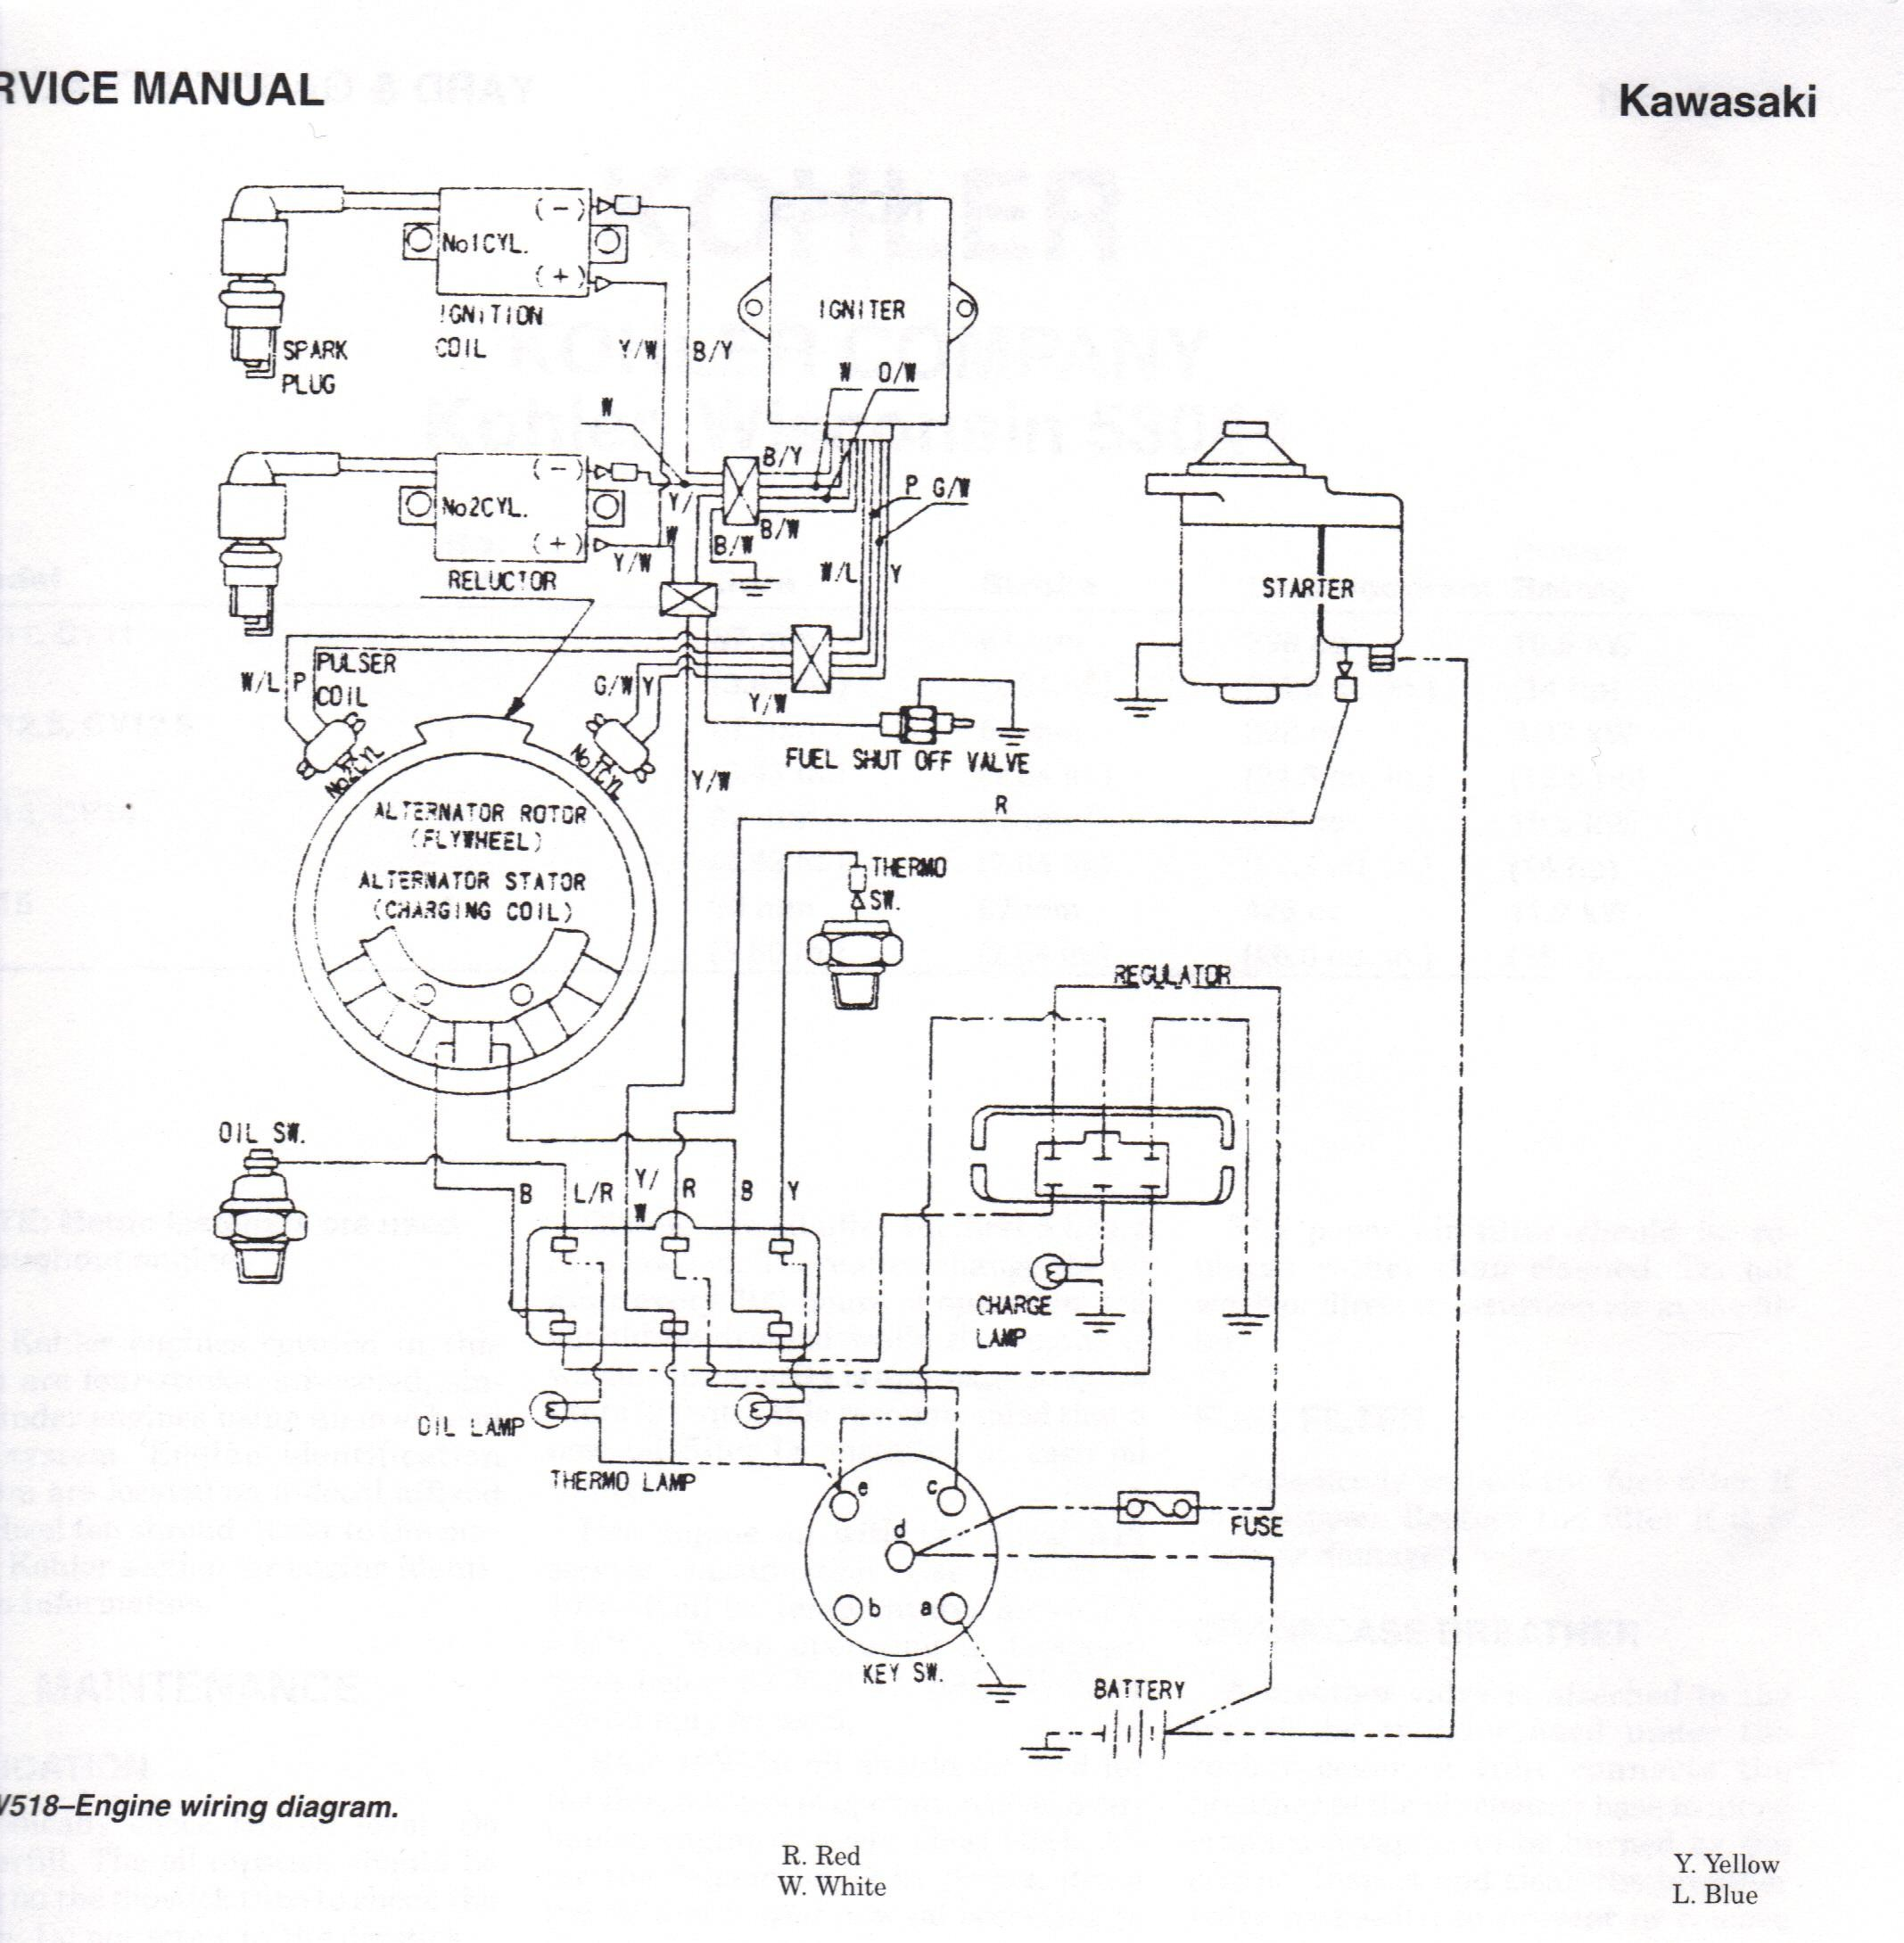 4ea3ab53 0dec 43a8 991f b05b9c b Kawasaki wiring JPG